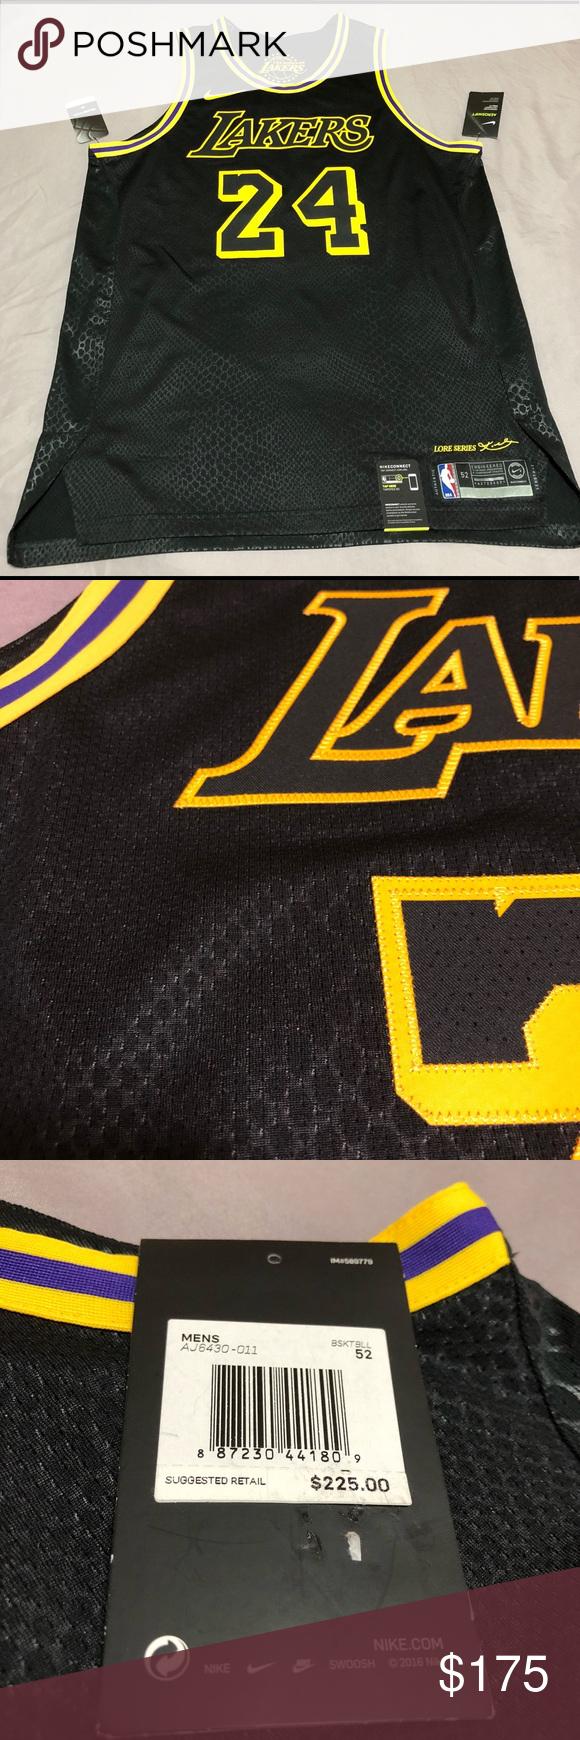 d9d47f7e5 NEW Nike LA Los Angeles Lakers Kobe Bryant Jersey New With Tags Nike Los  Angeles Lakers